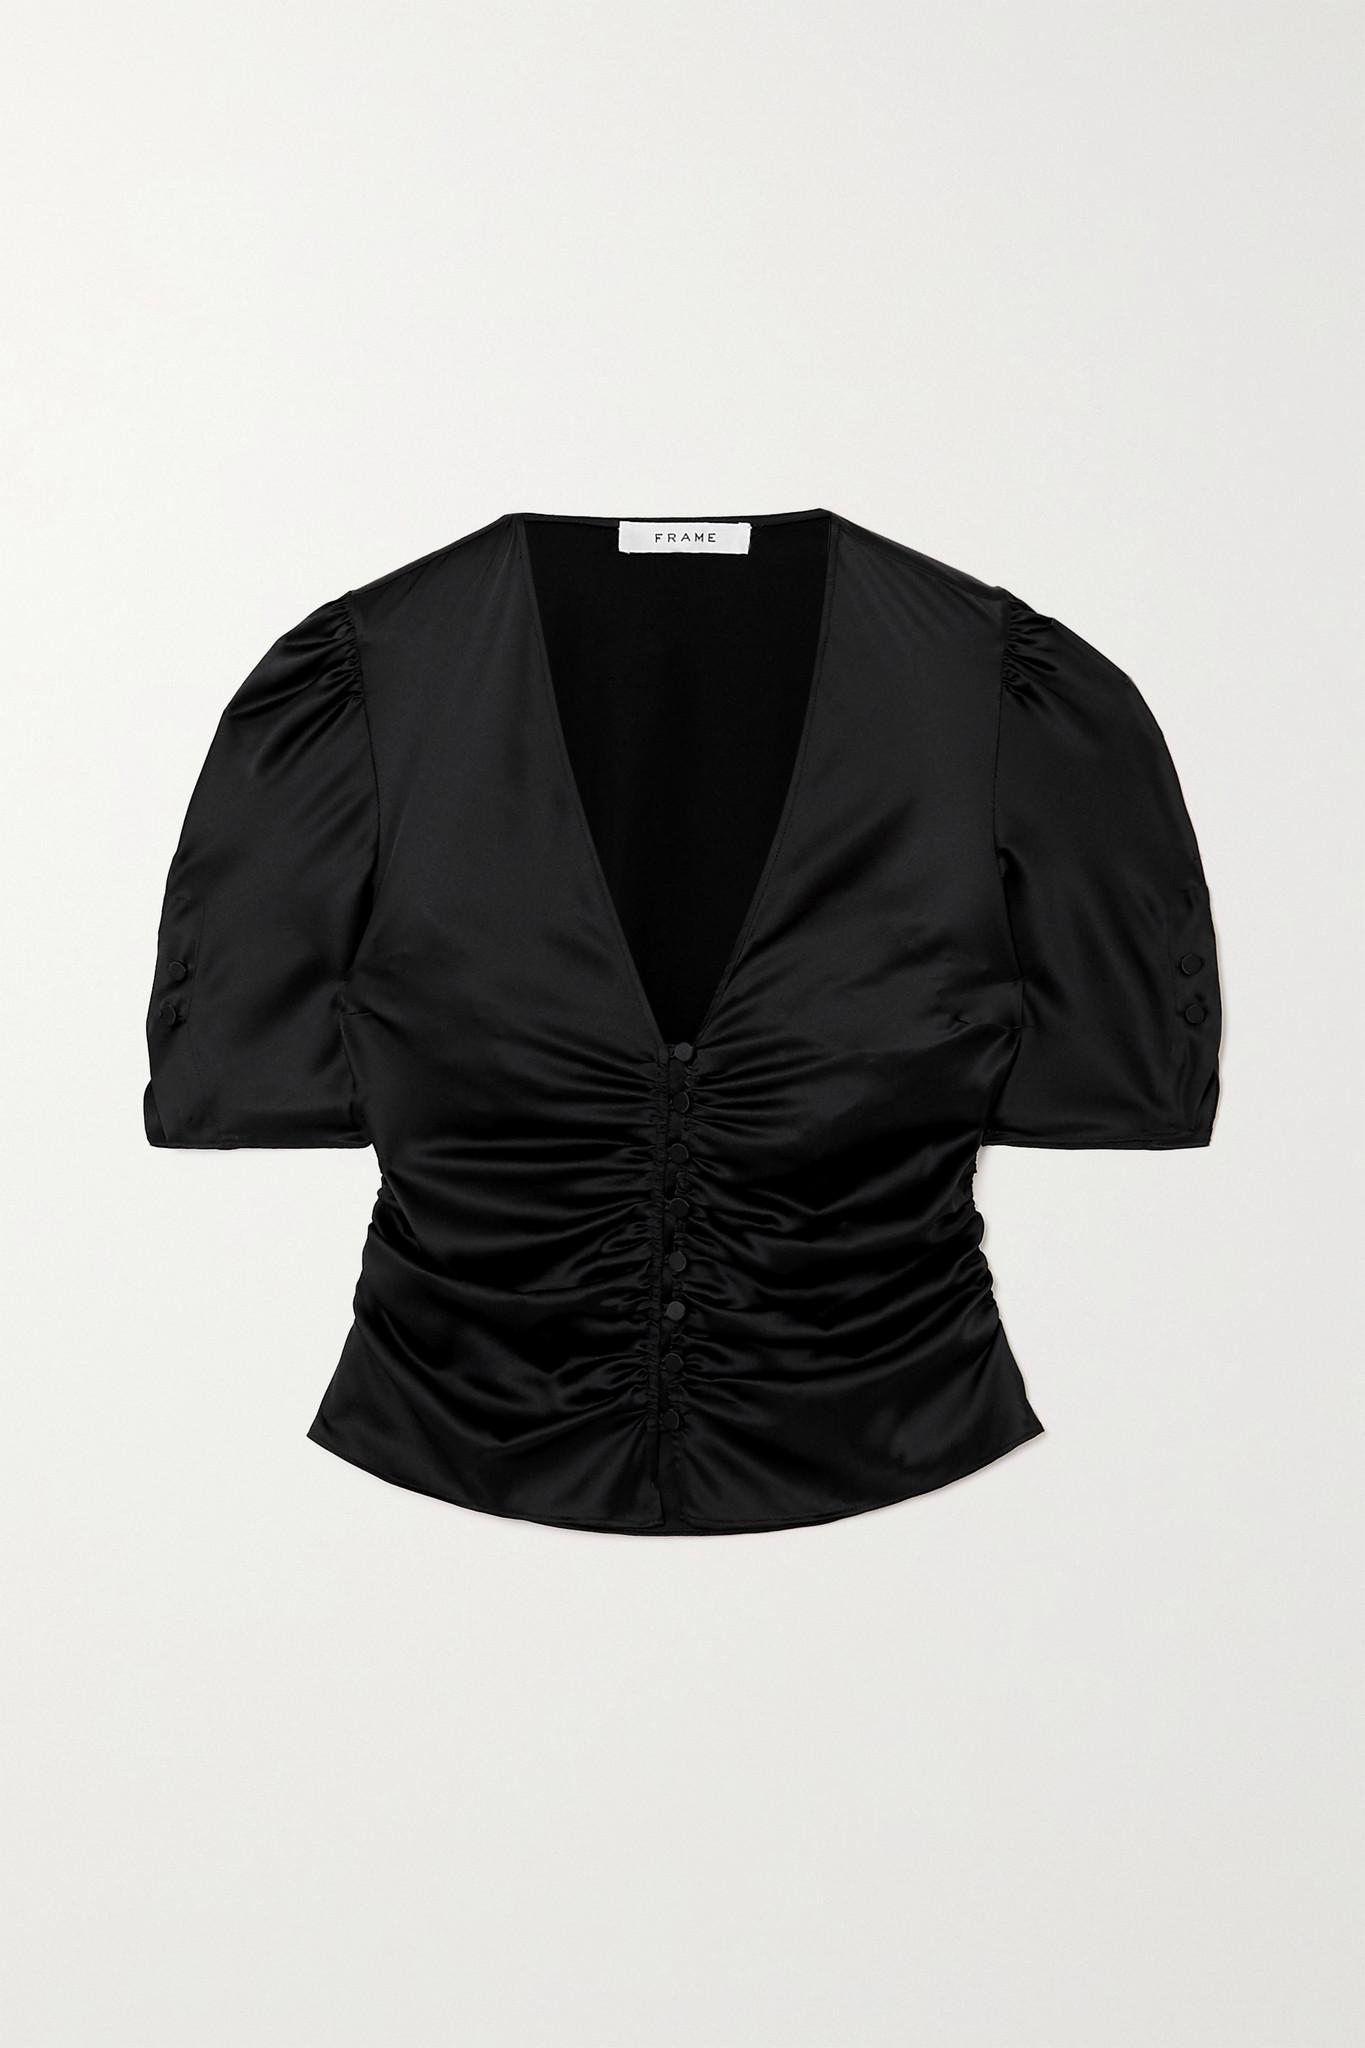 FRAME - Camile 褶饰单利丝缎上衣 - 黑色 - medium